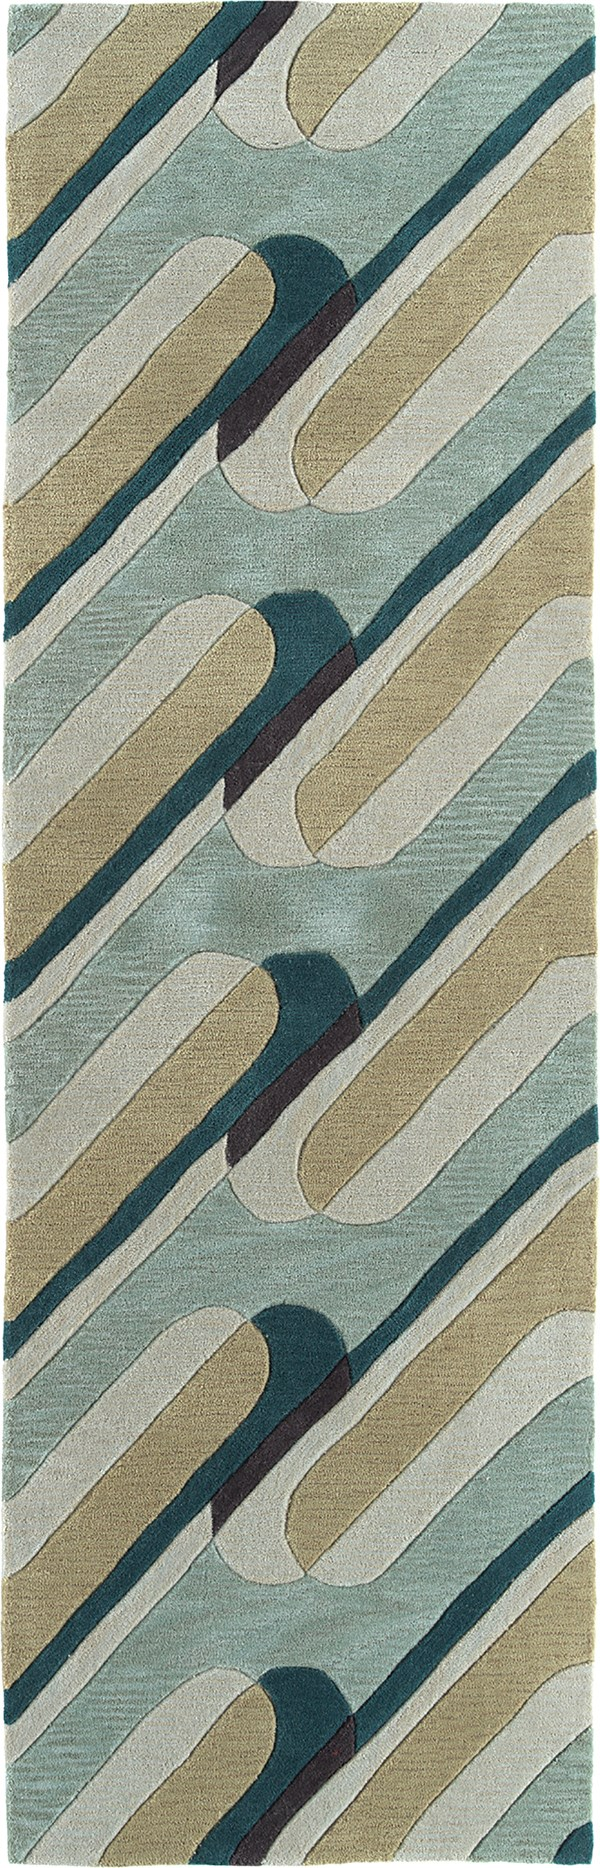 Teal (91) Contemporary / Modern Area Rug